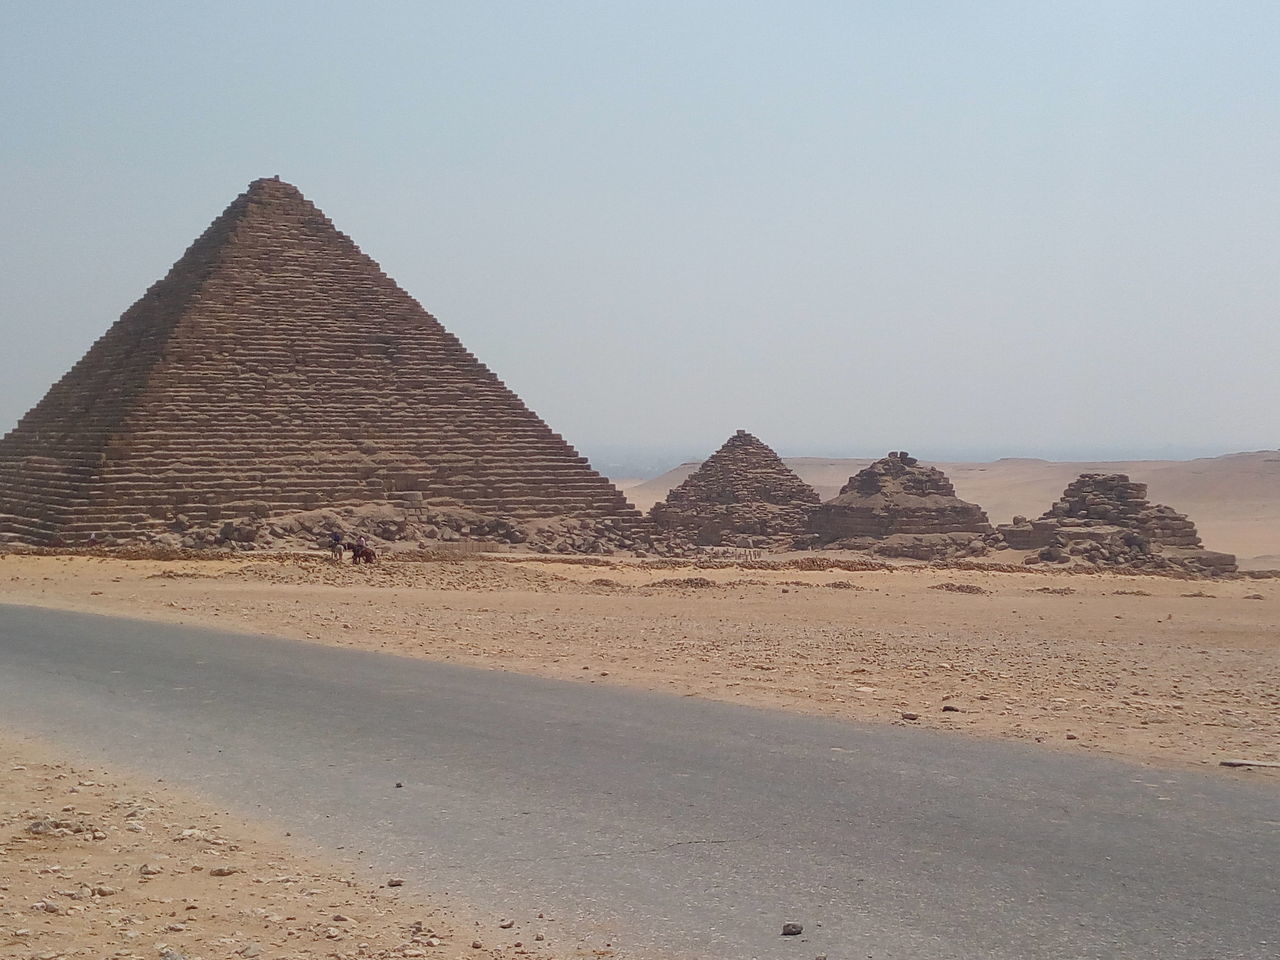 Khafra Pyramid in Giza - Egypt Ancient Desert Khafra Pyramid Pyramid Sunny Day Travel First Eyeem Photo